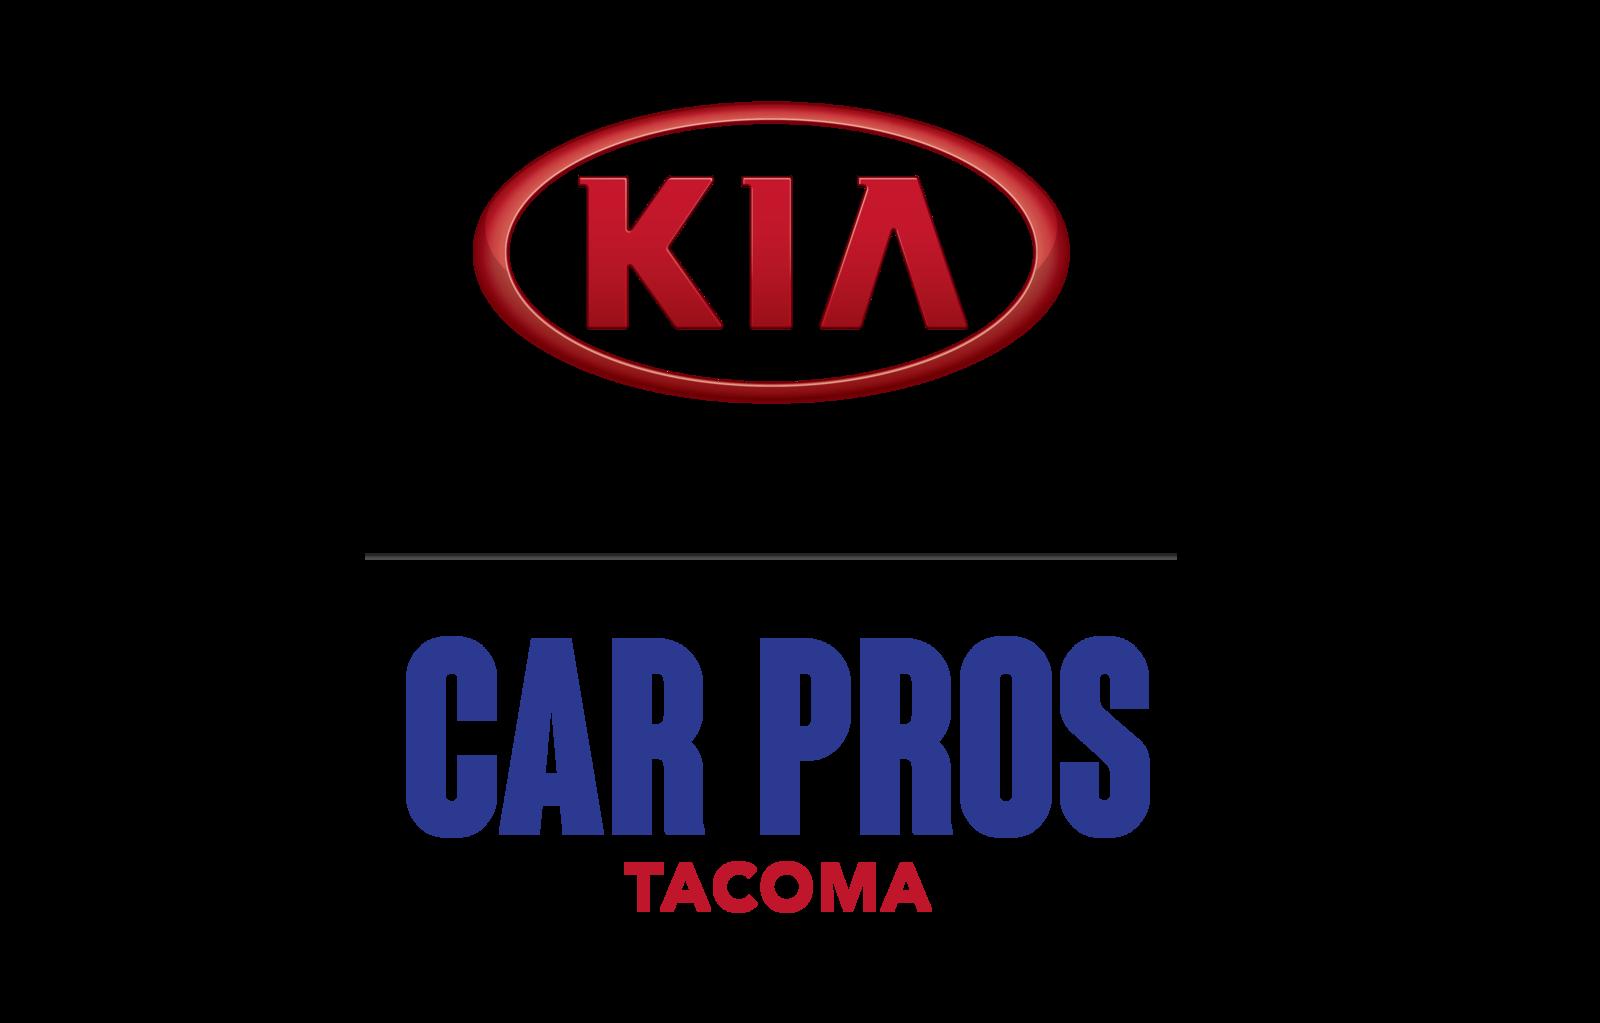 Car Pros Tacoma >> Car Pros Kia Tacoma Wa Read Consumer Reviews Browse Used And